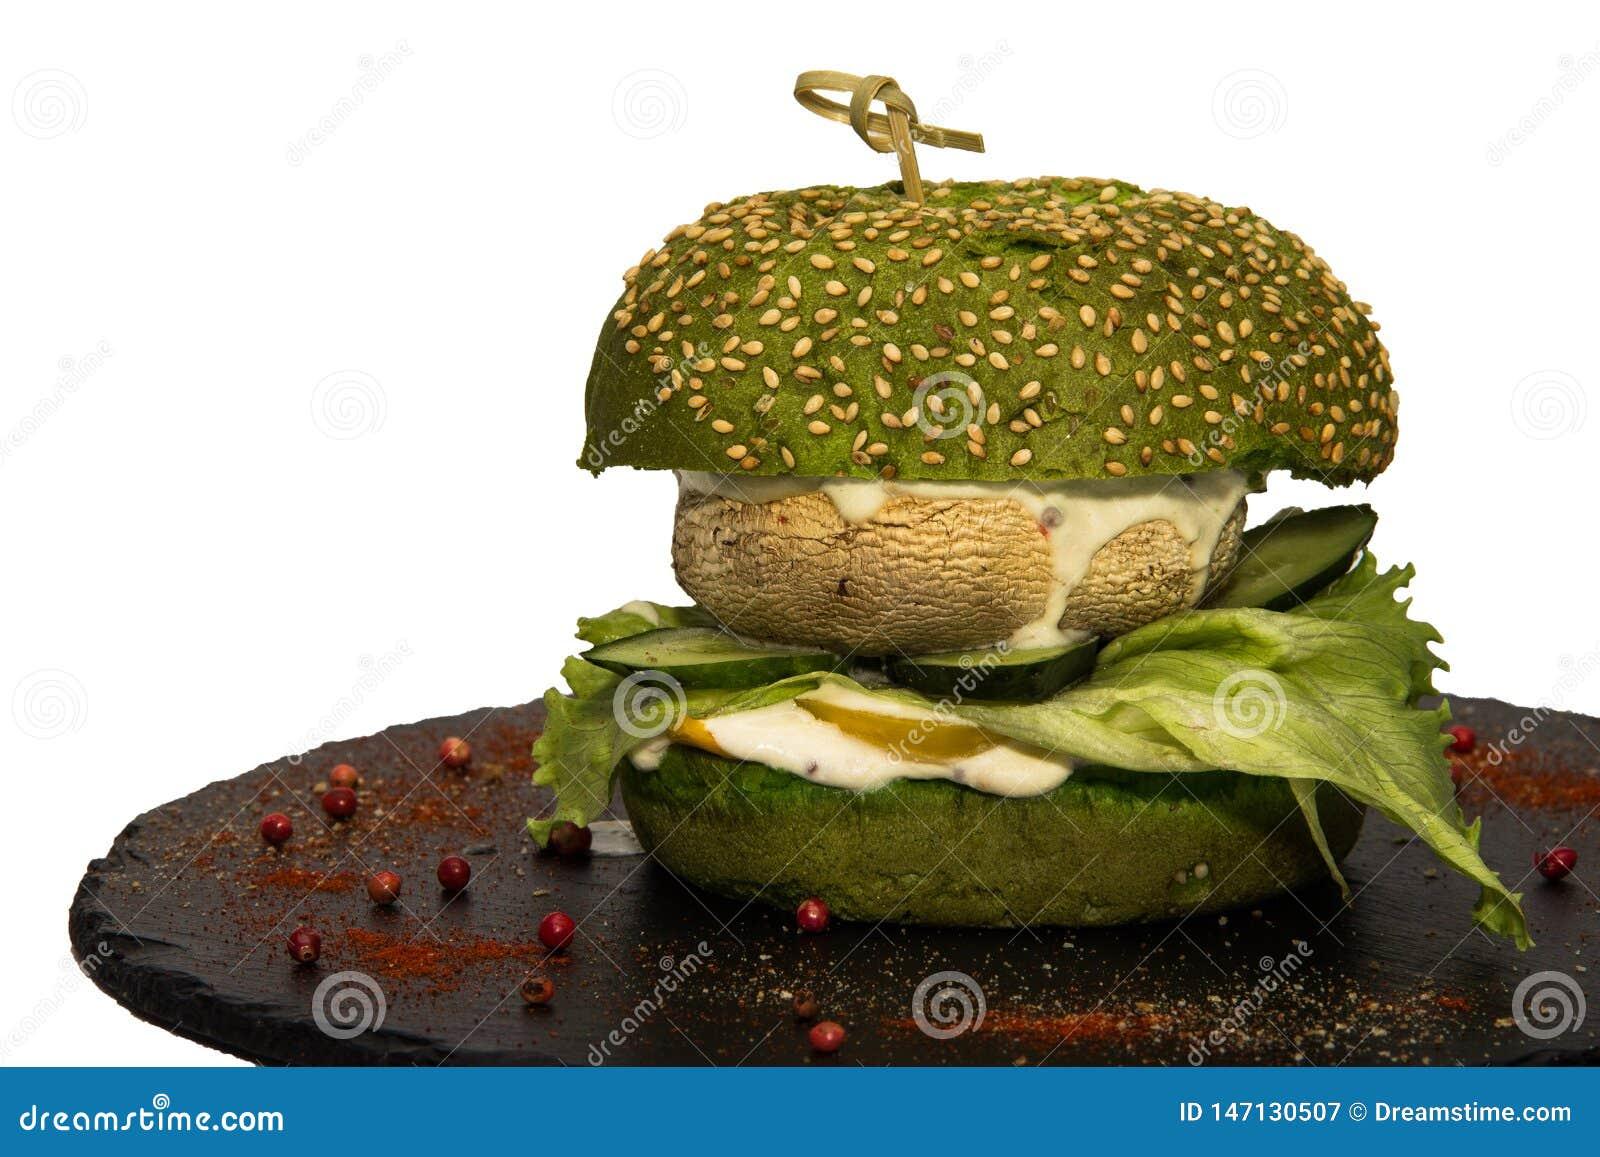 Jarski hamburger z liściem zielona sałatka, szampinion, ogórki i kumberland,